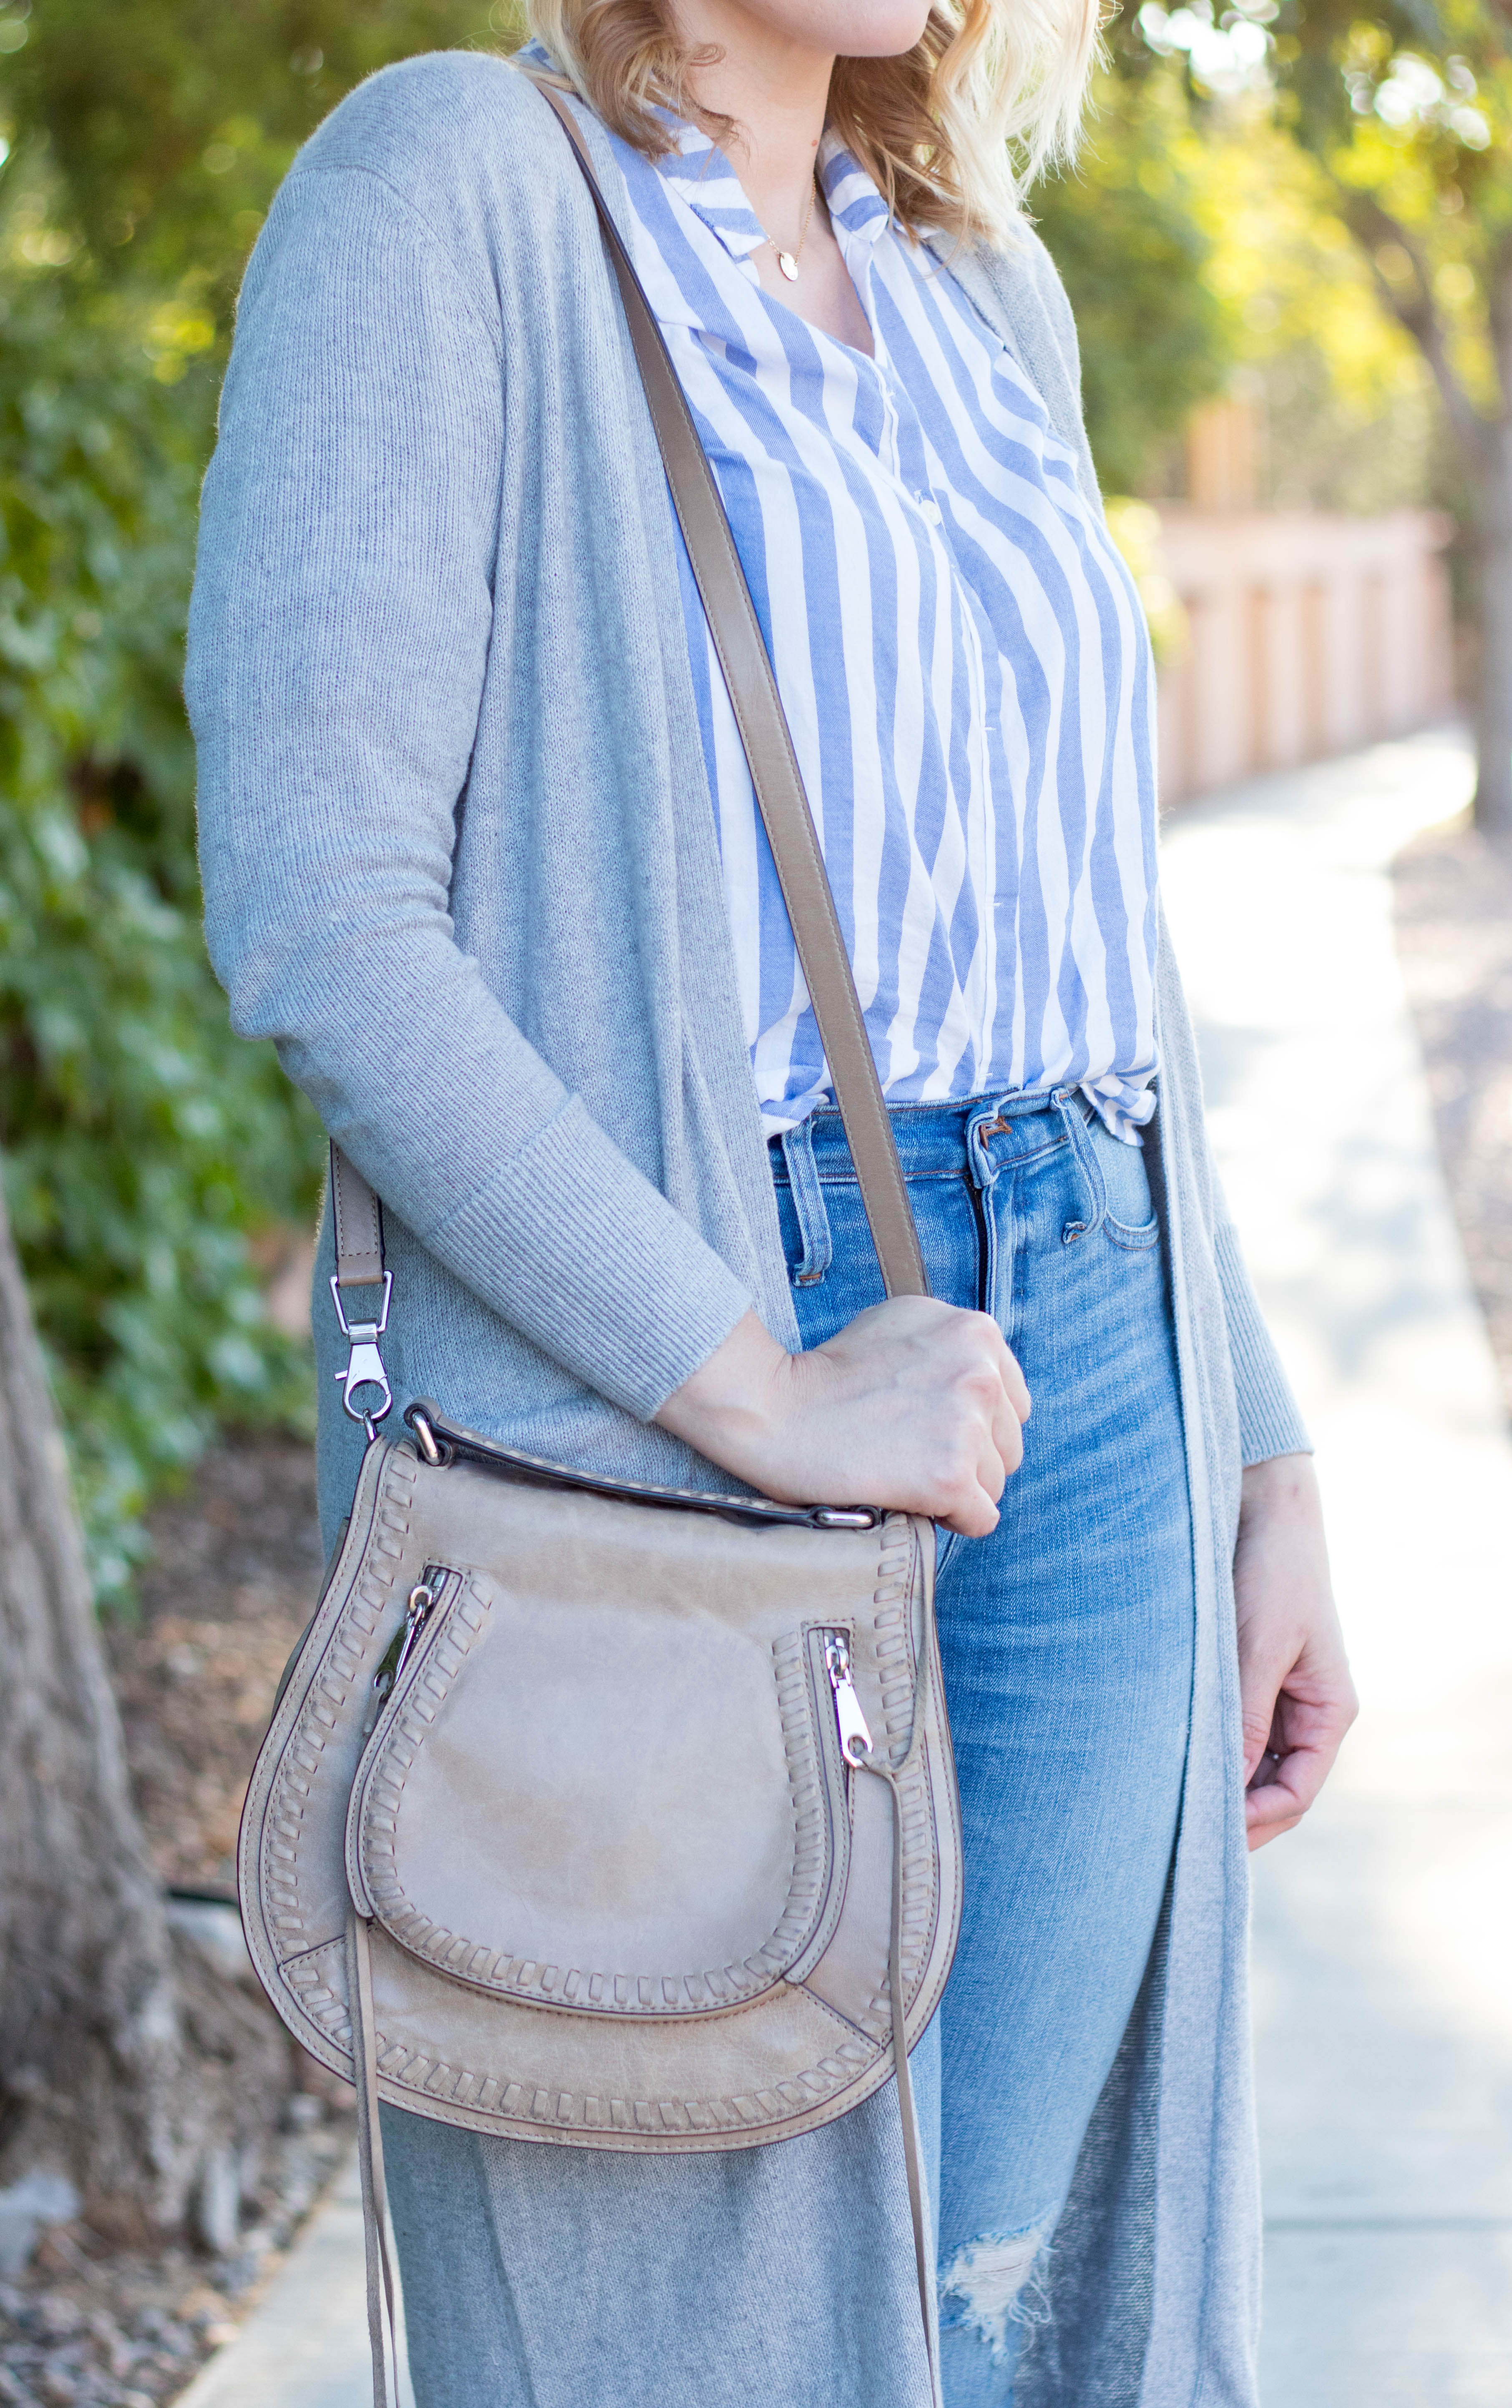 rebecca minkoff vanity saddle bag #myrm #rebeccaminkoff #saddlebag